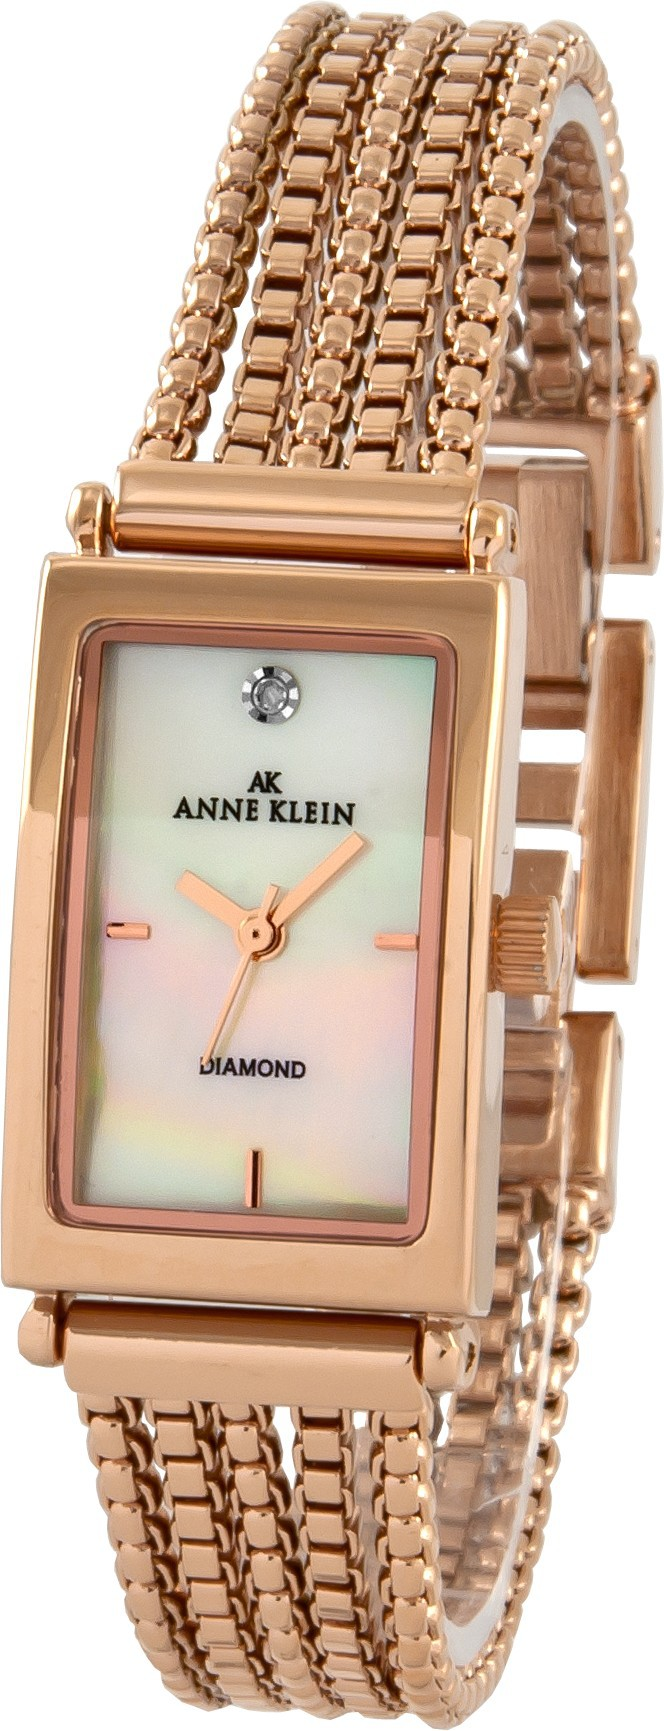 Часы anne klein diamond